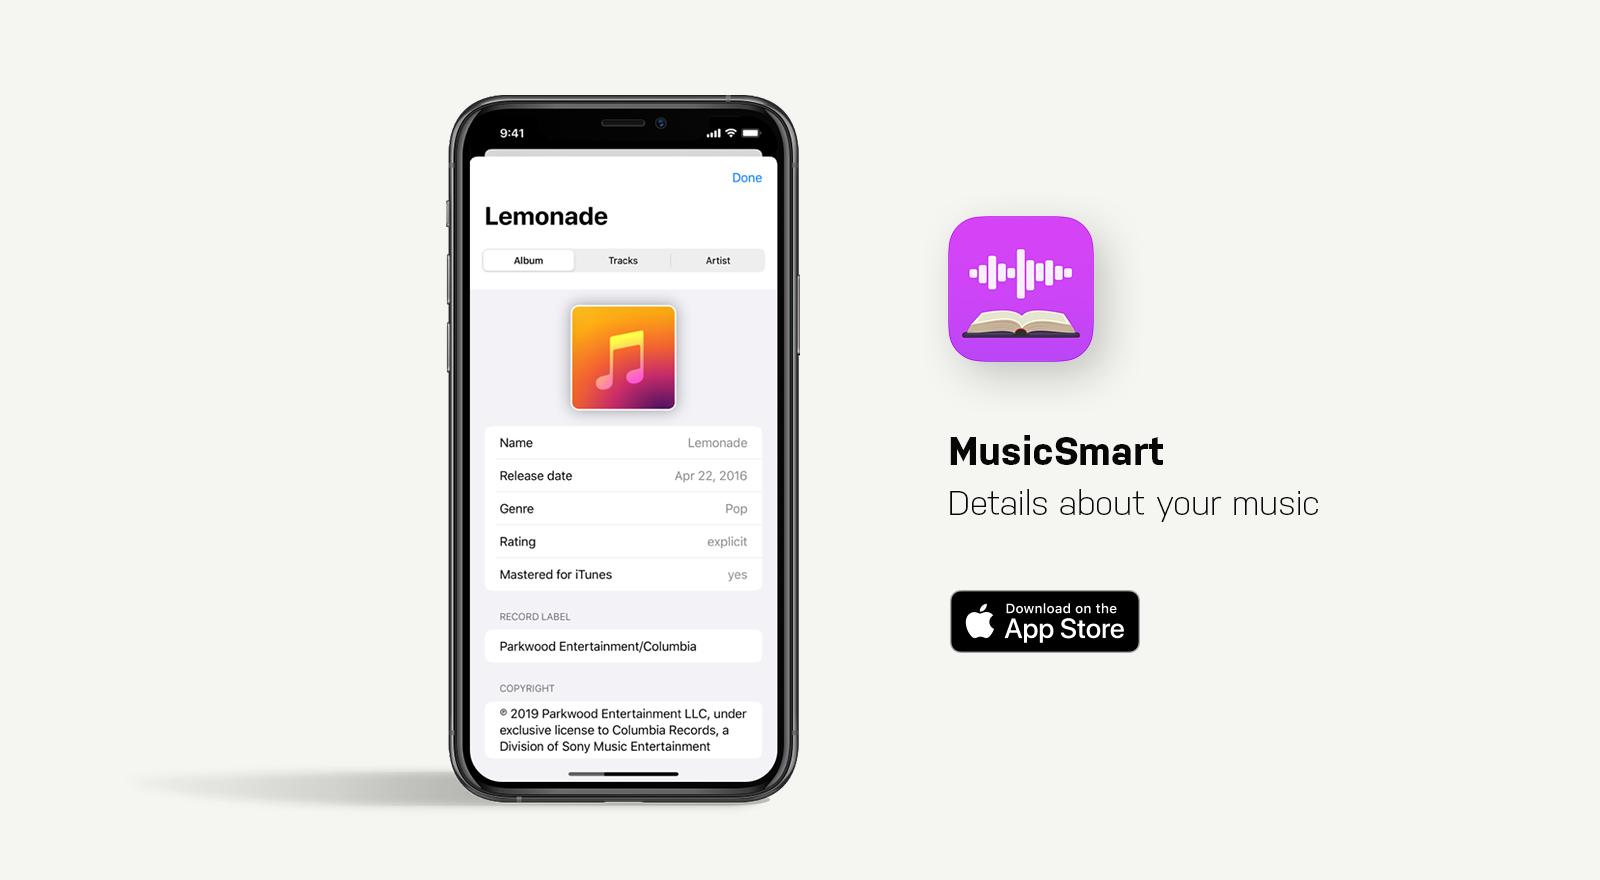 MusicSmart App